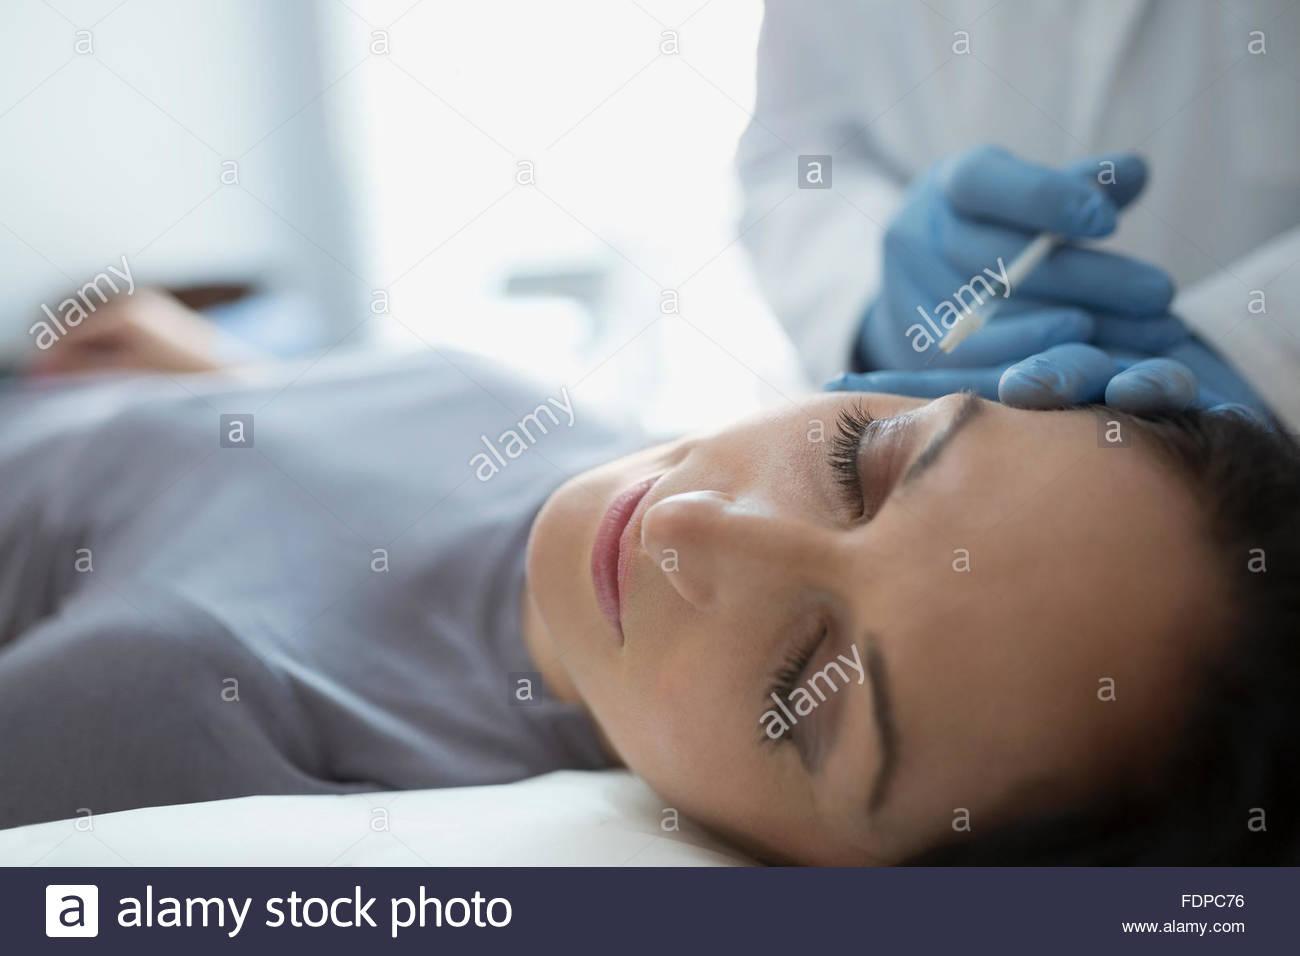 Woman receiving Botox injection - Stock Image